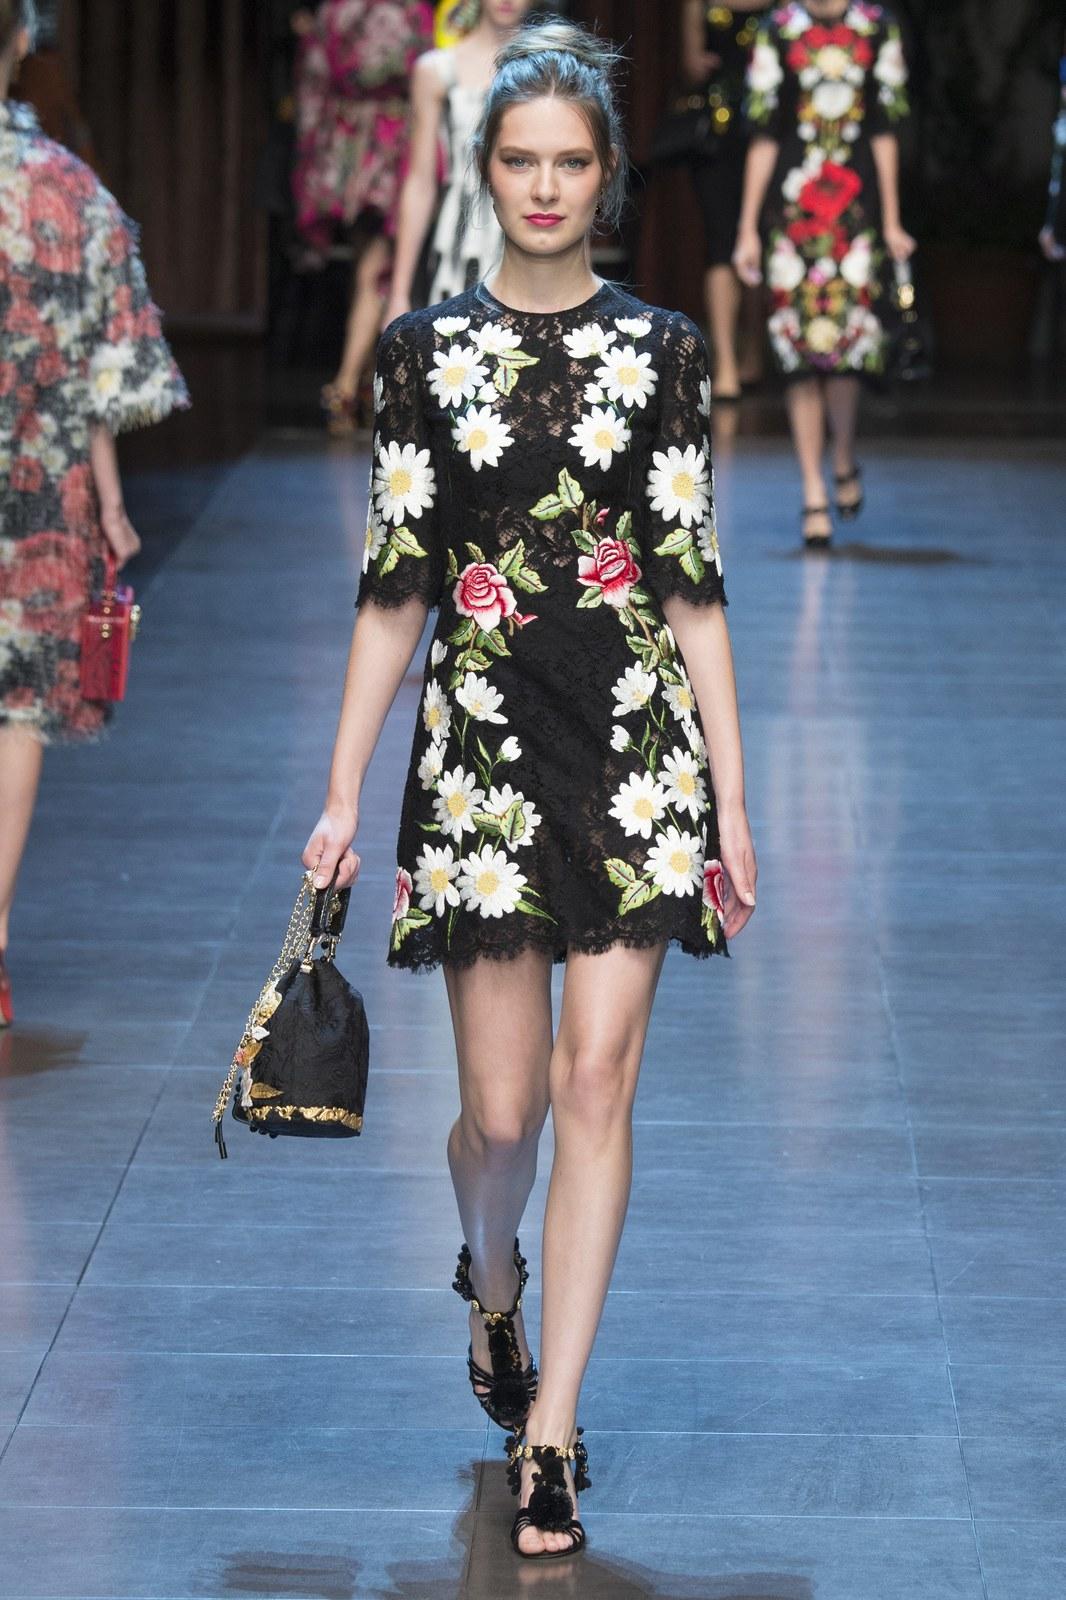 Dolce & Gabbana 2016 Daisy Dress Cheap From China Best Price XfvEKRS6